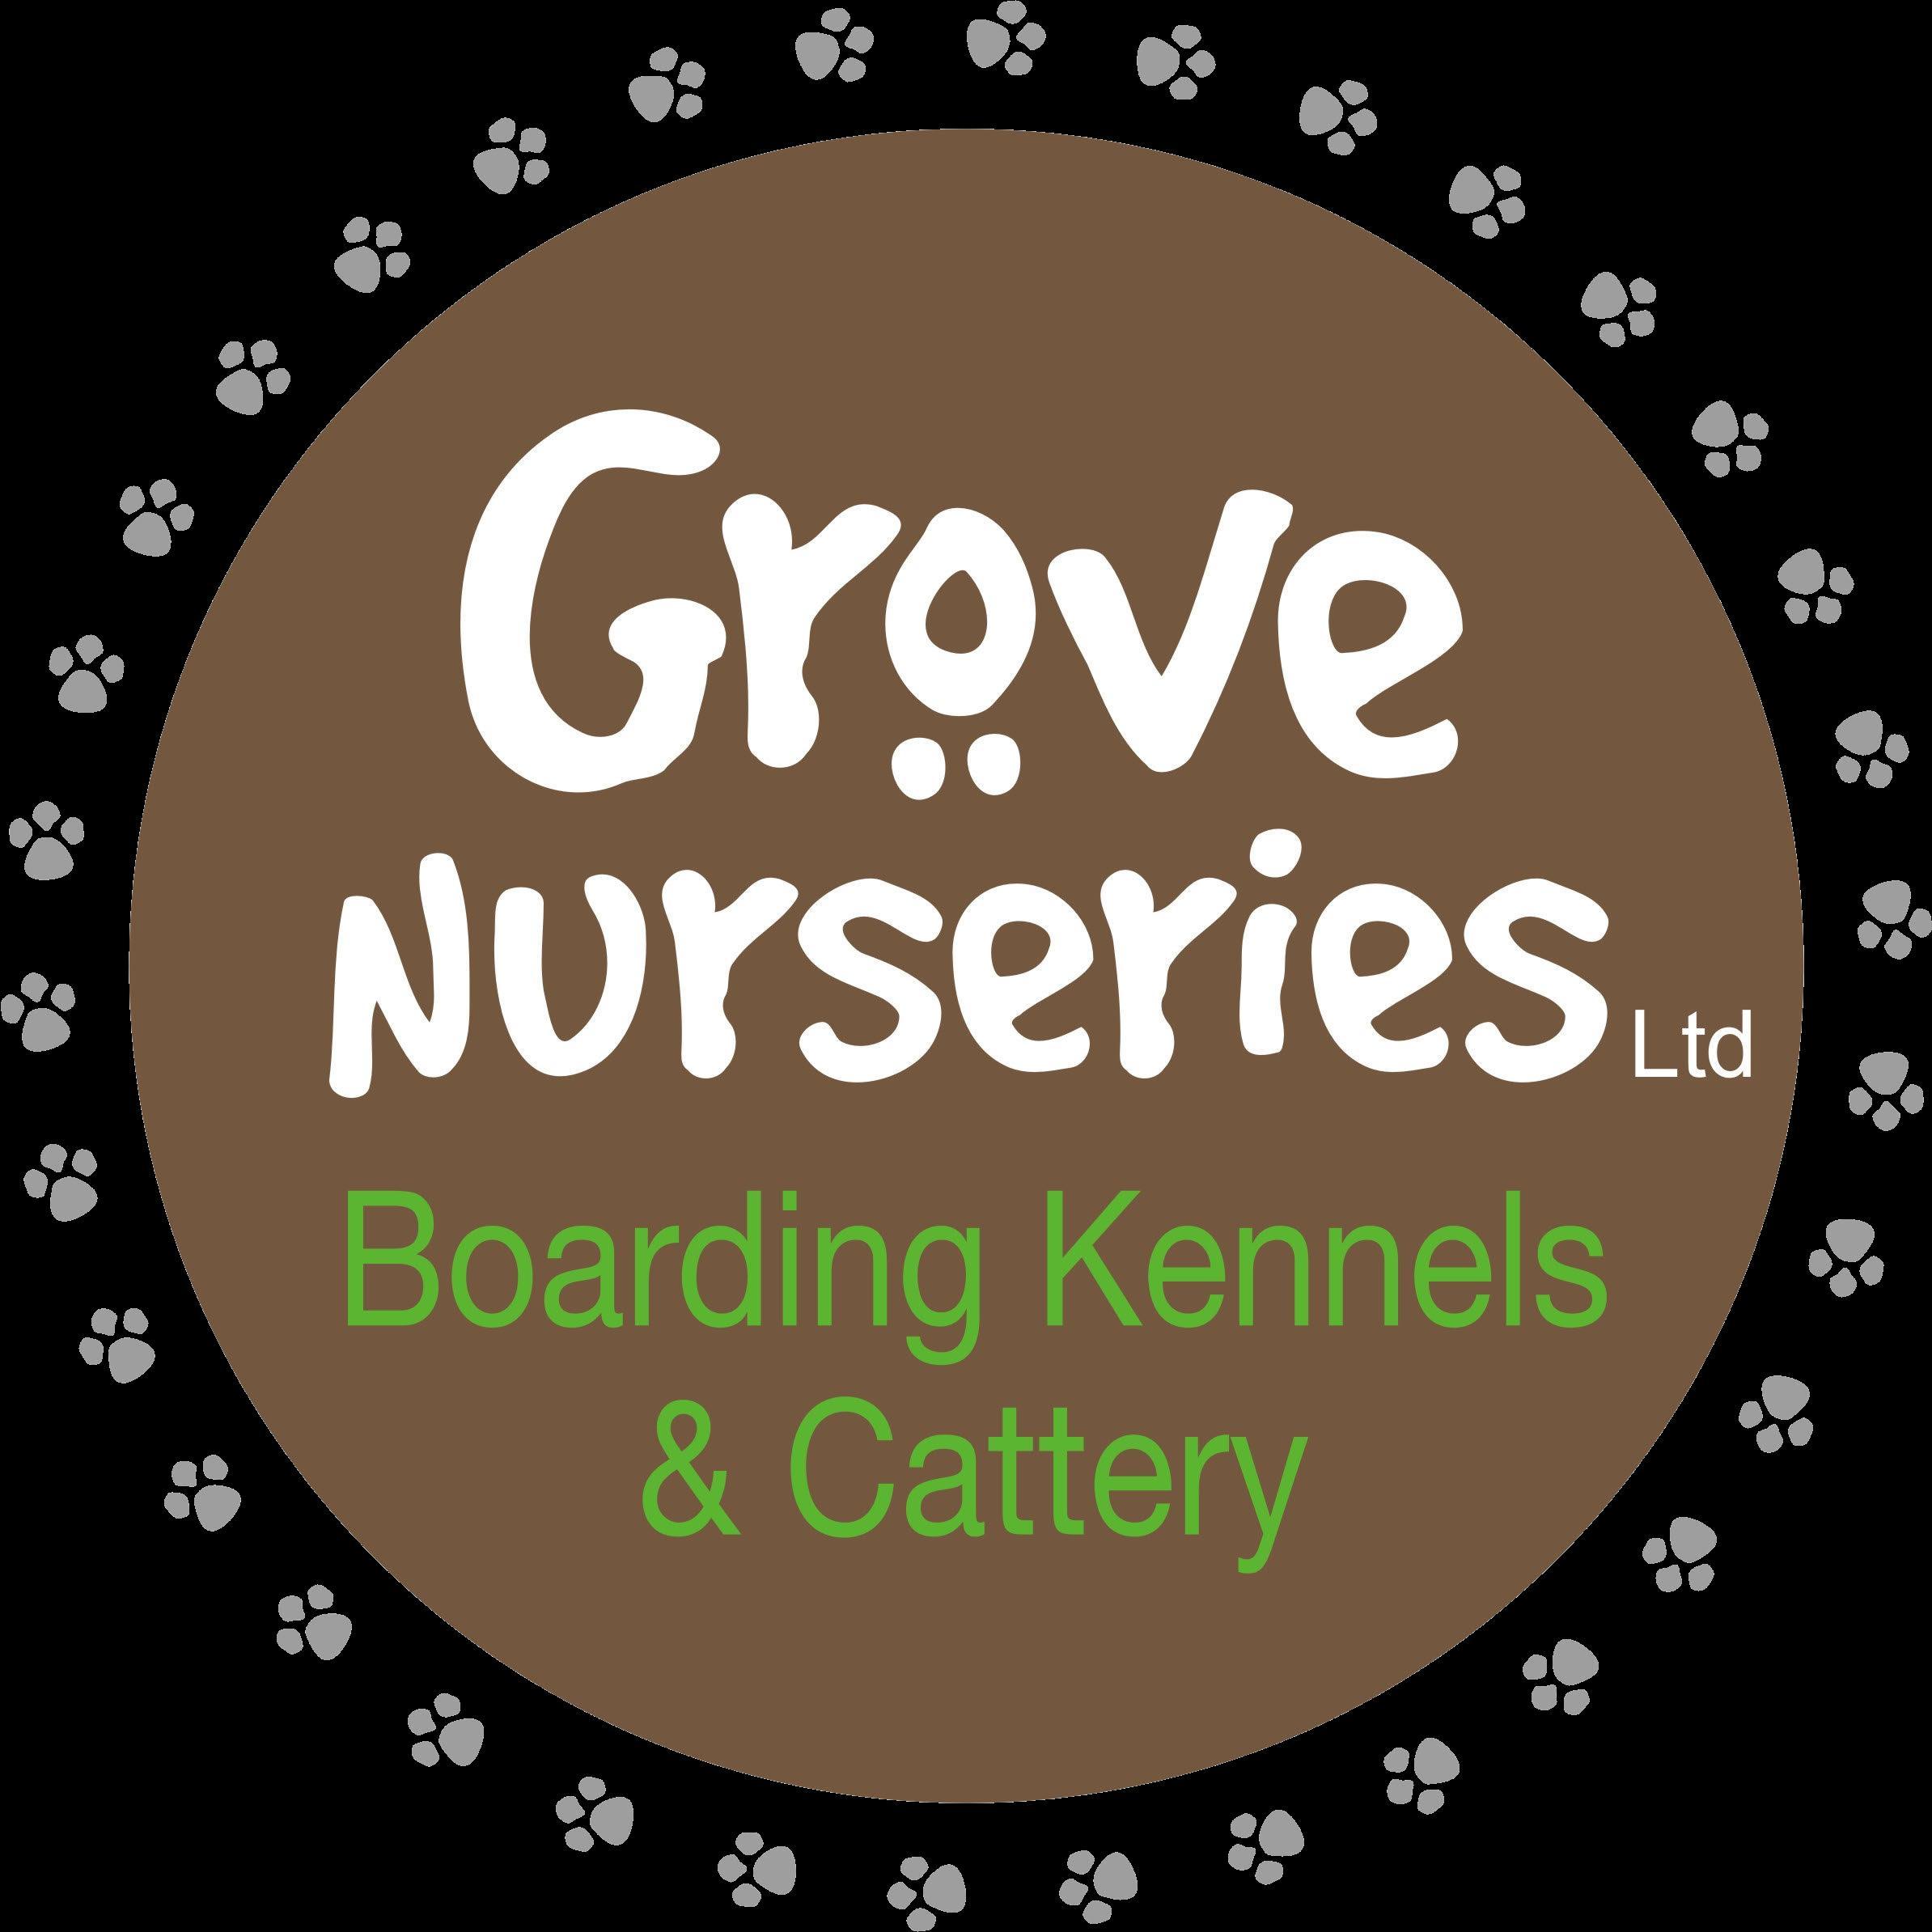 Grove Nurseries Boarding Kennels & Cattery